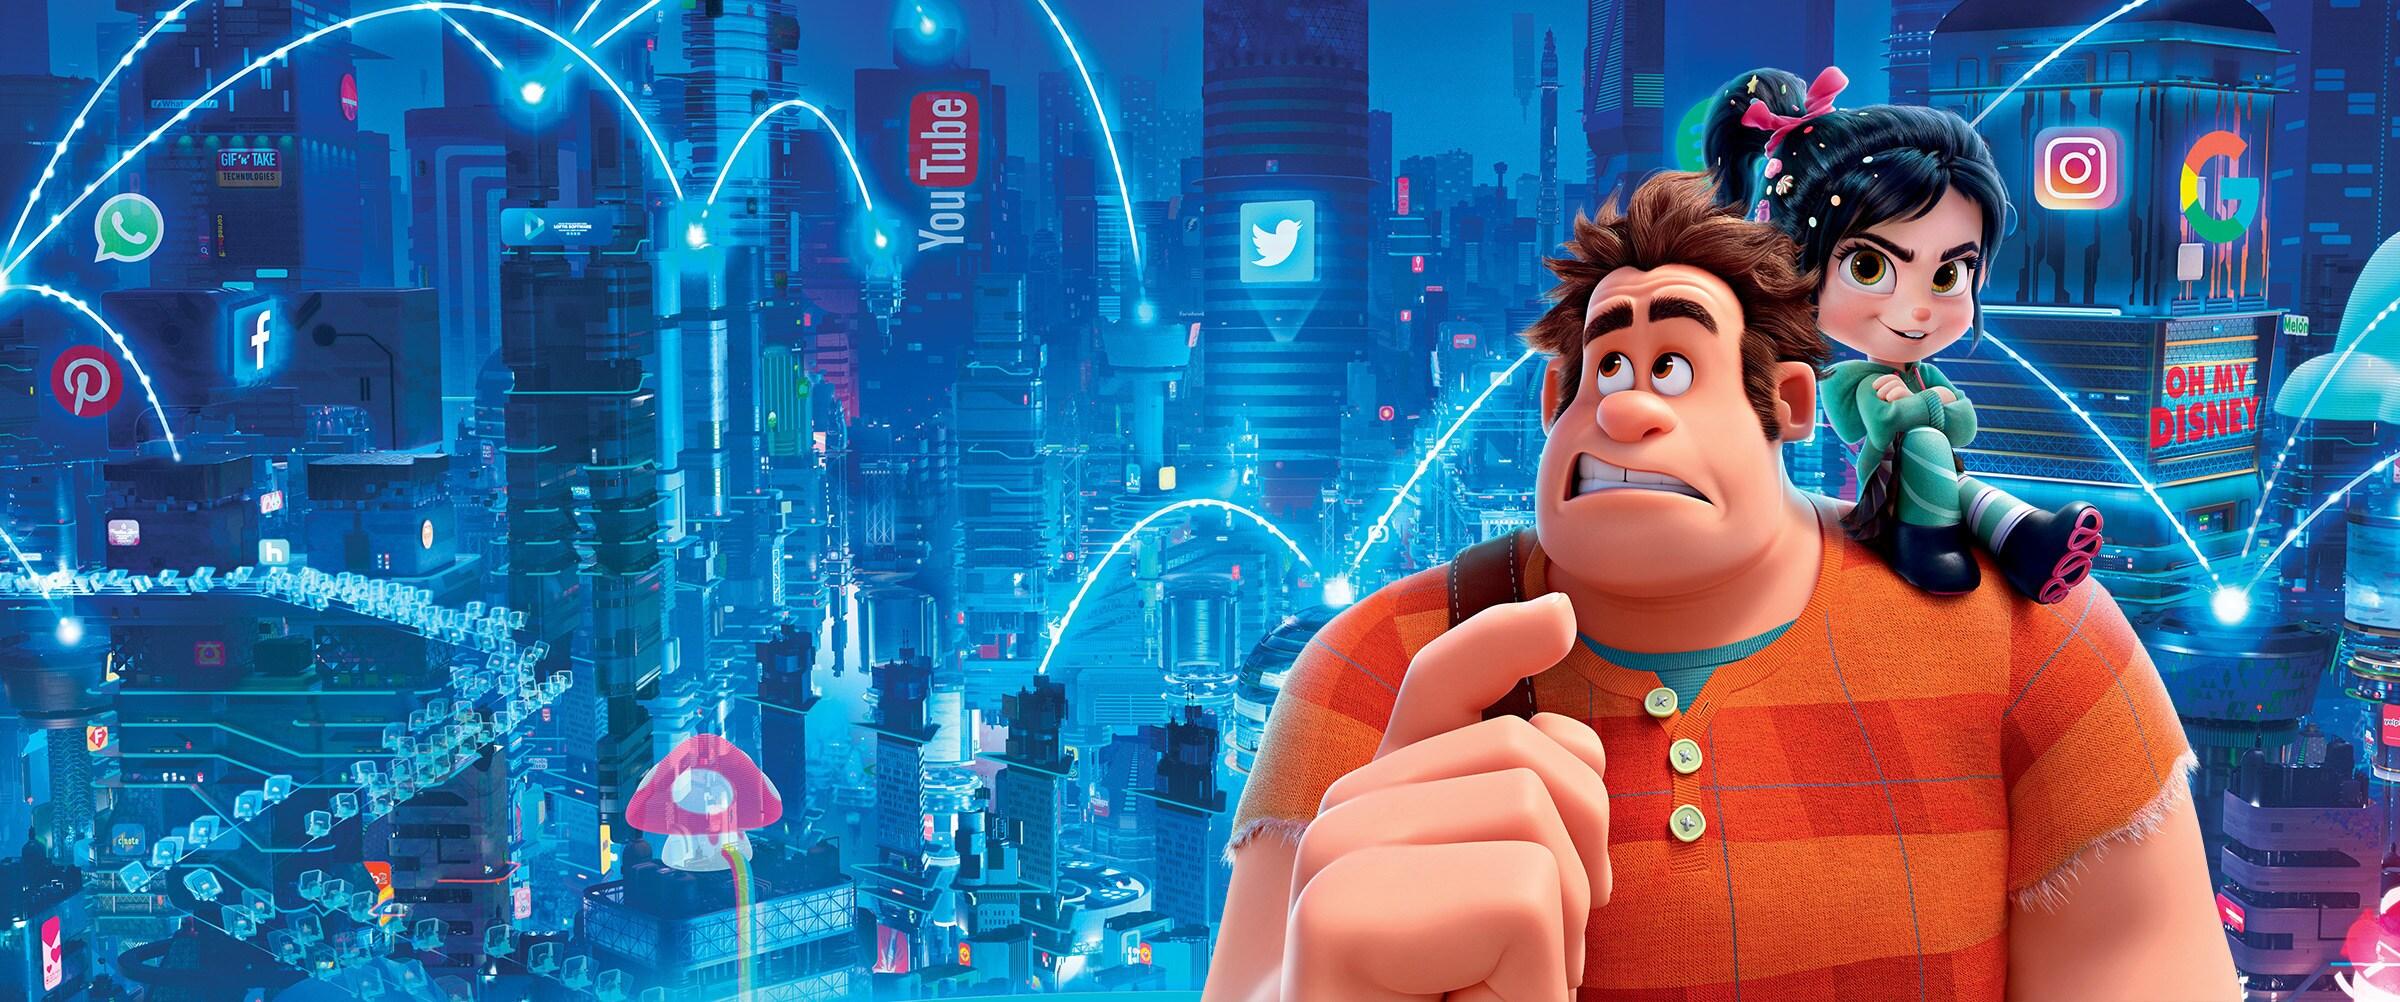 Wreck-It Ralph 2 | Trailer Hero | Movie